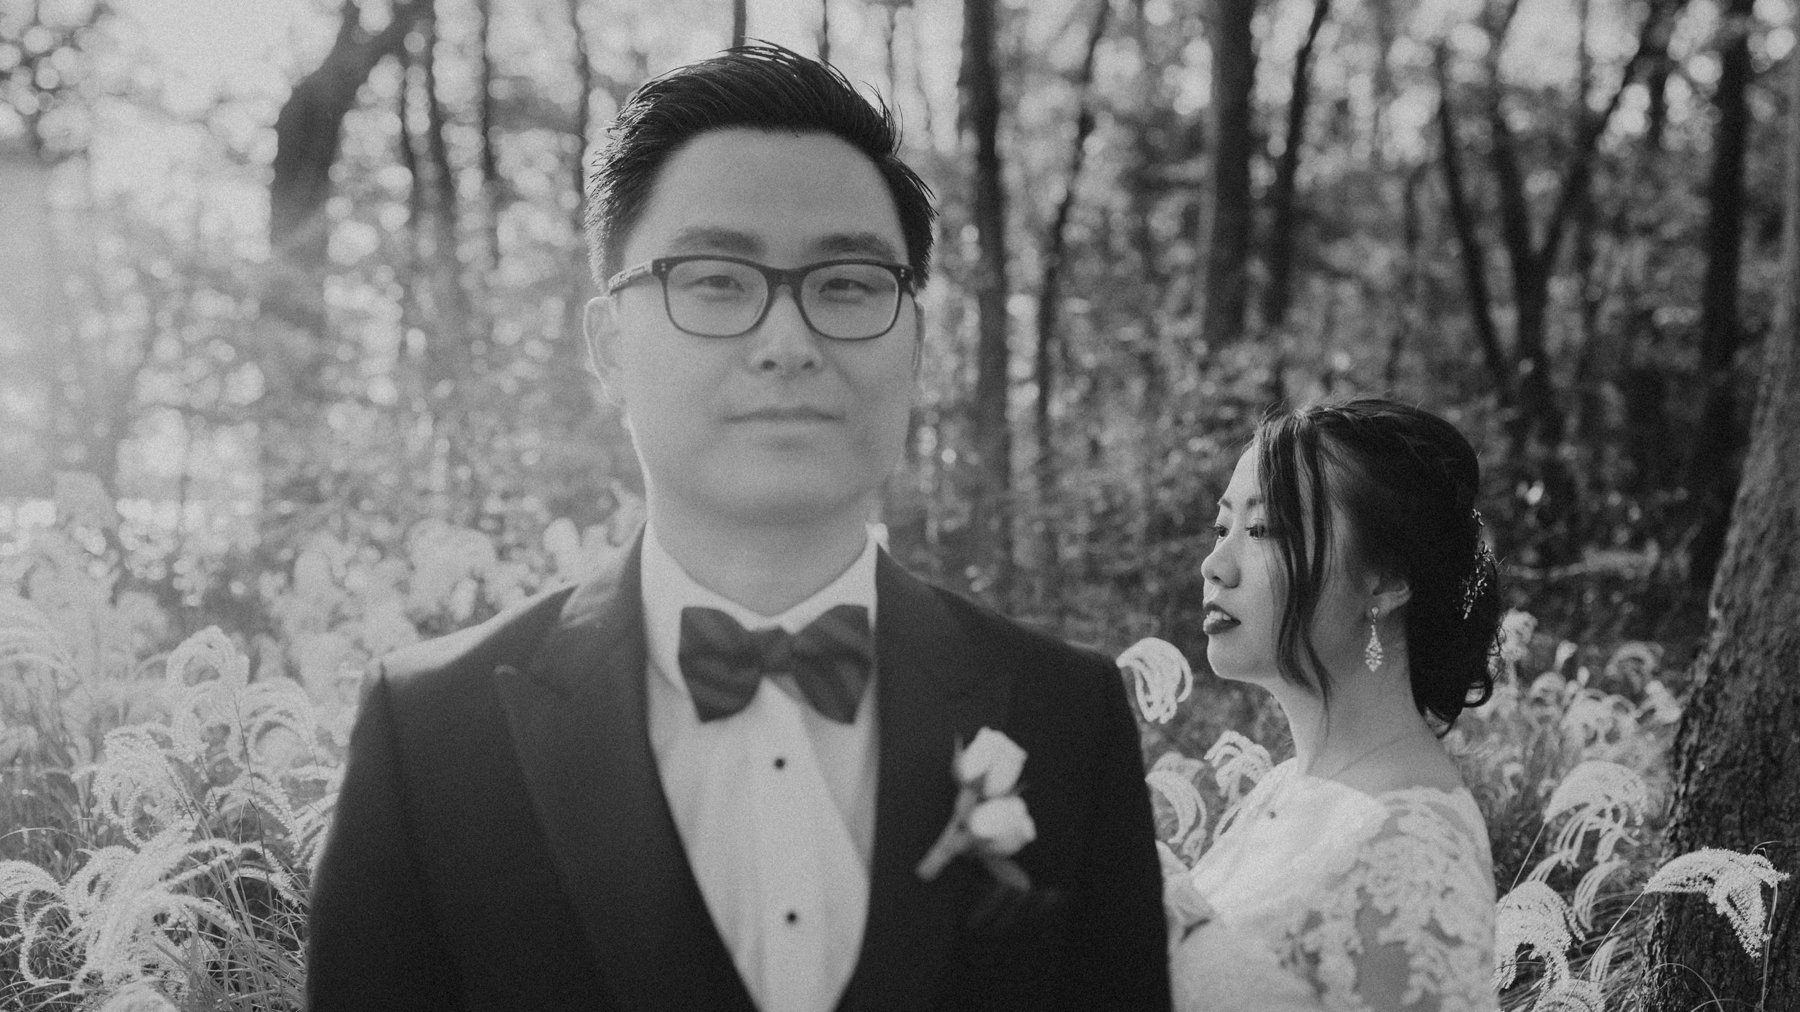 173-168-pen-ryn-mansion-wedding-8.jpg